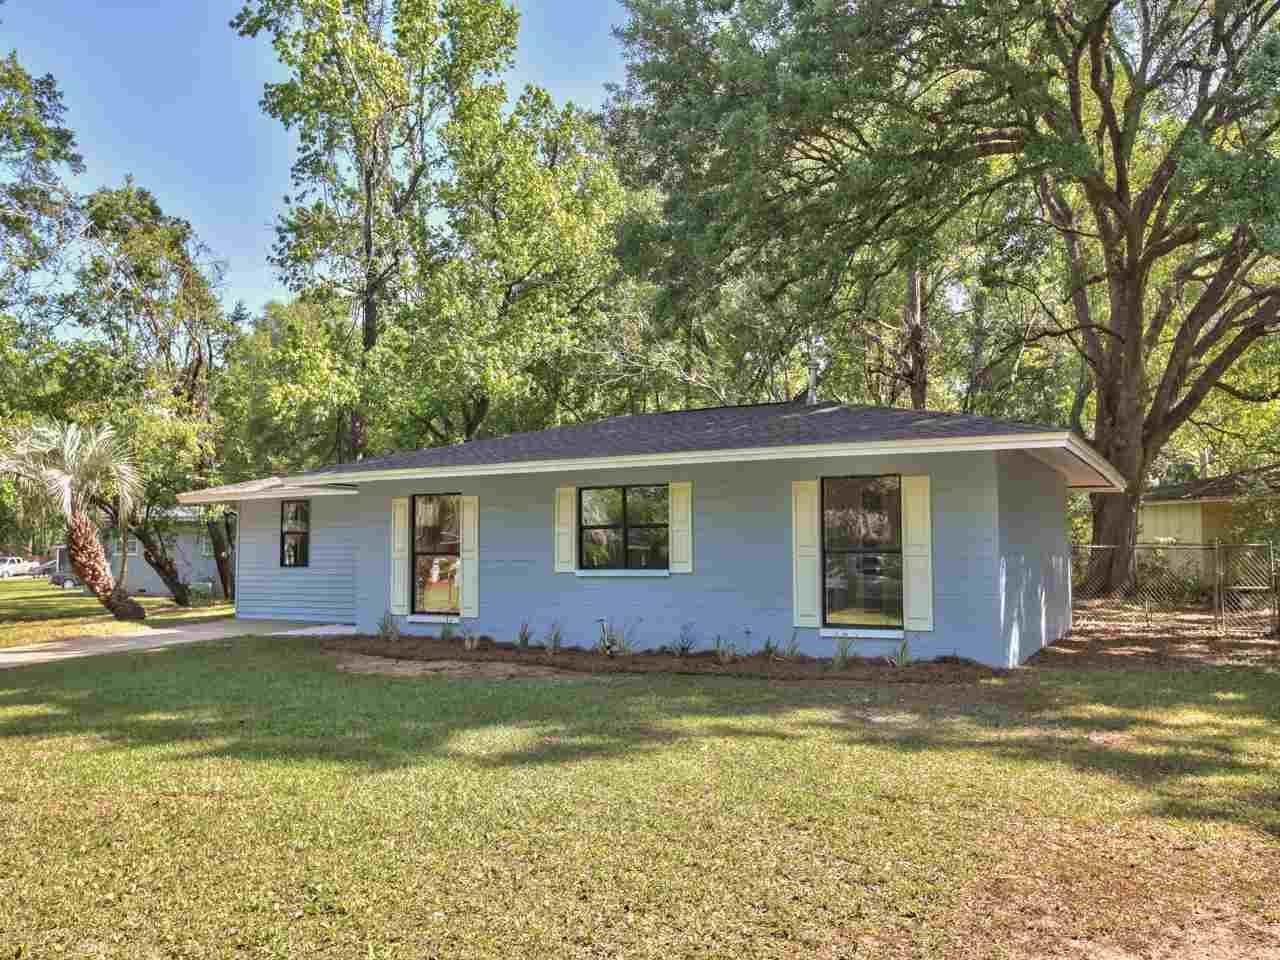 Photo of 2905 Harwood, TALLAHASSEE, FL 32301 (MLS # 330636)